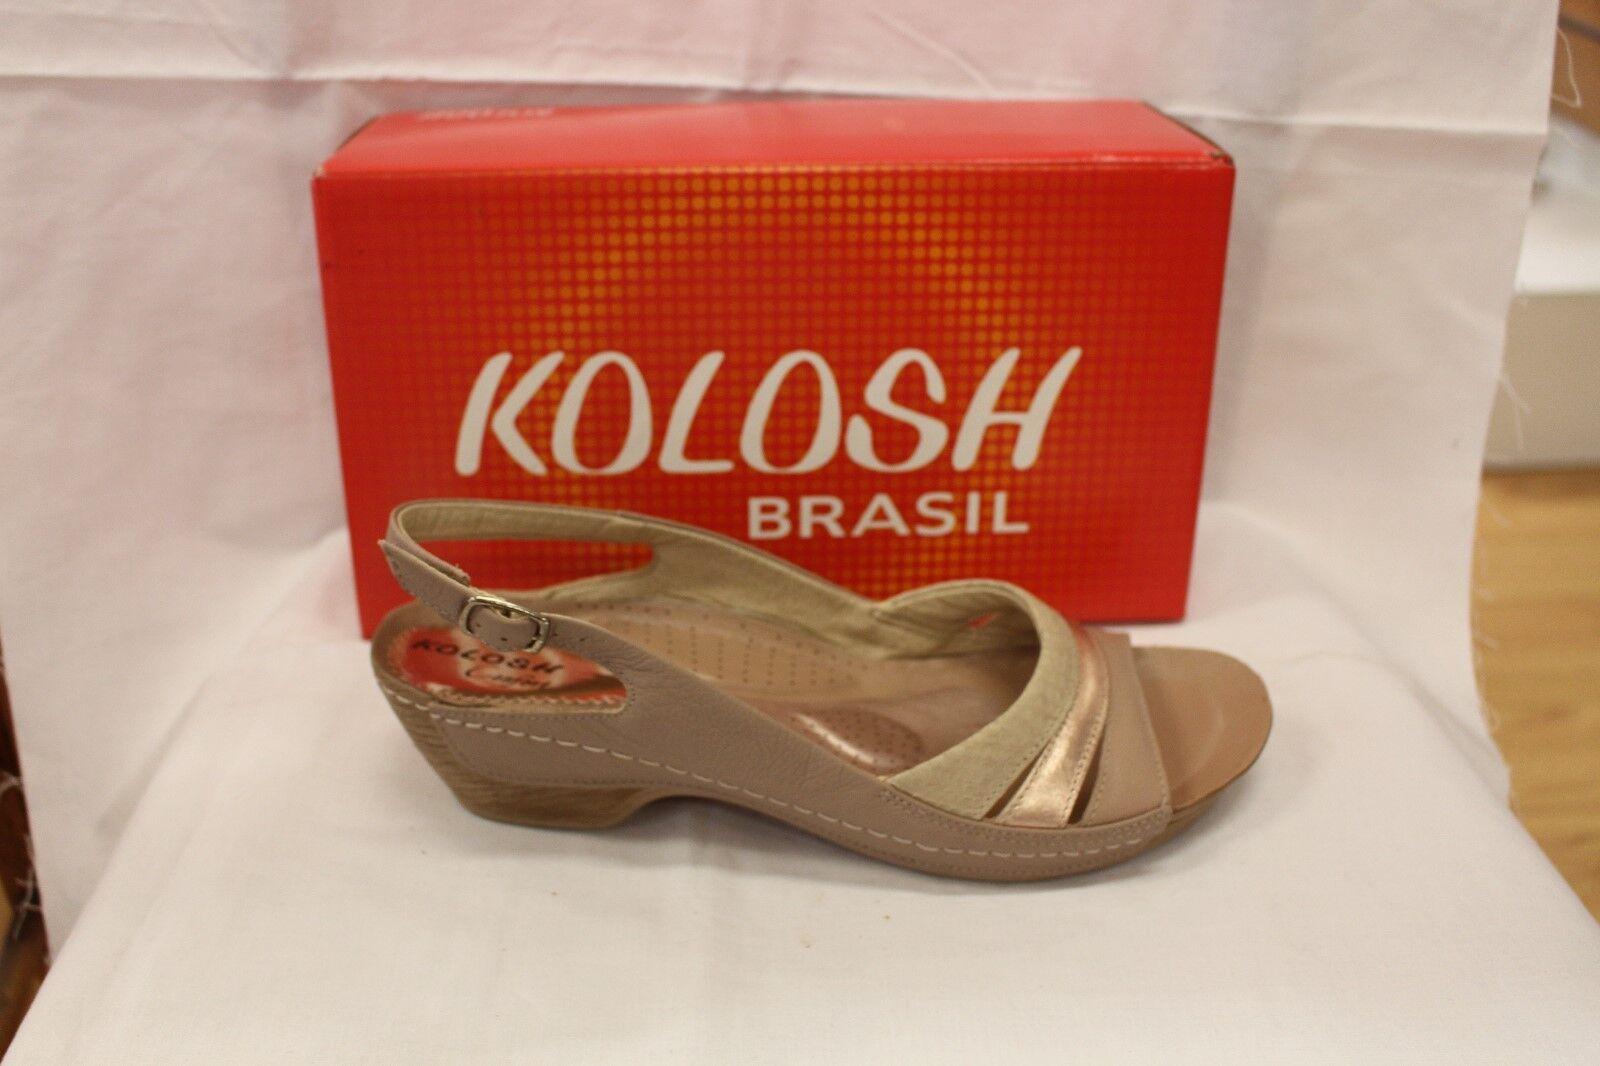 03978cddc59 LADIES SHOES FOOTWEAR sandal beige -Kolosh L3872 ntutpt5741-Women's ...